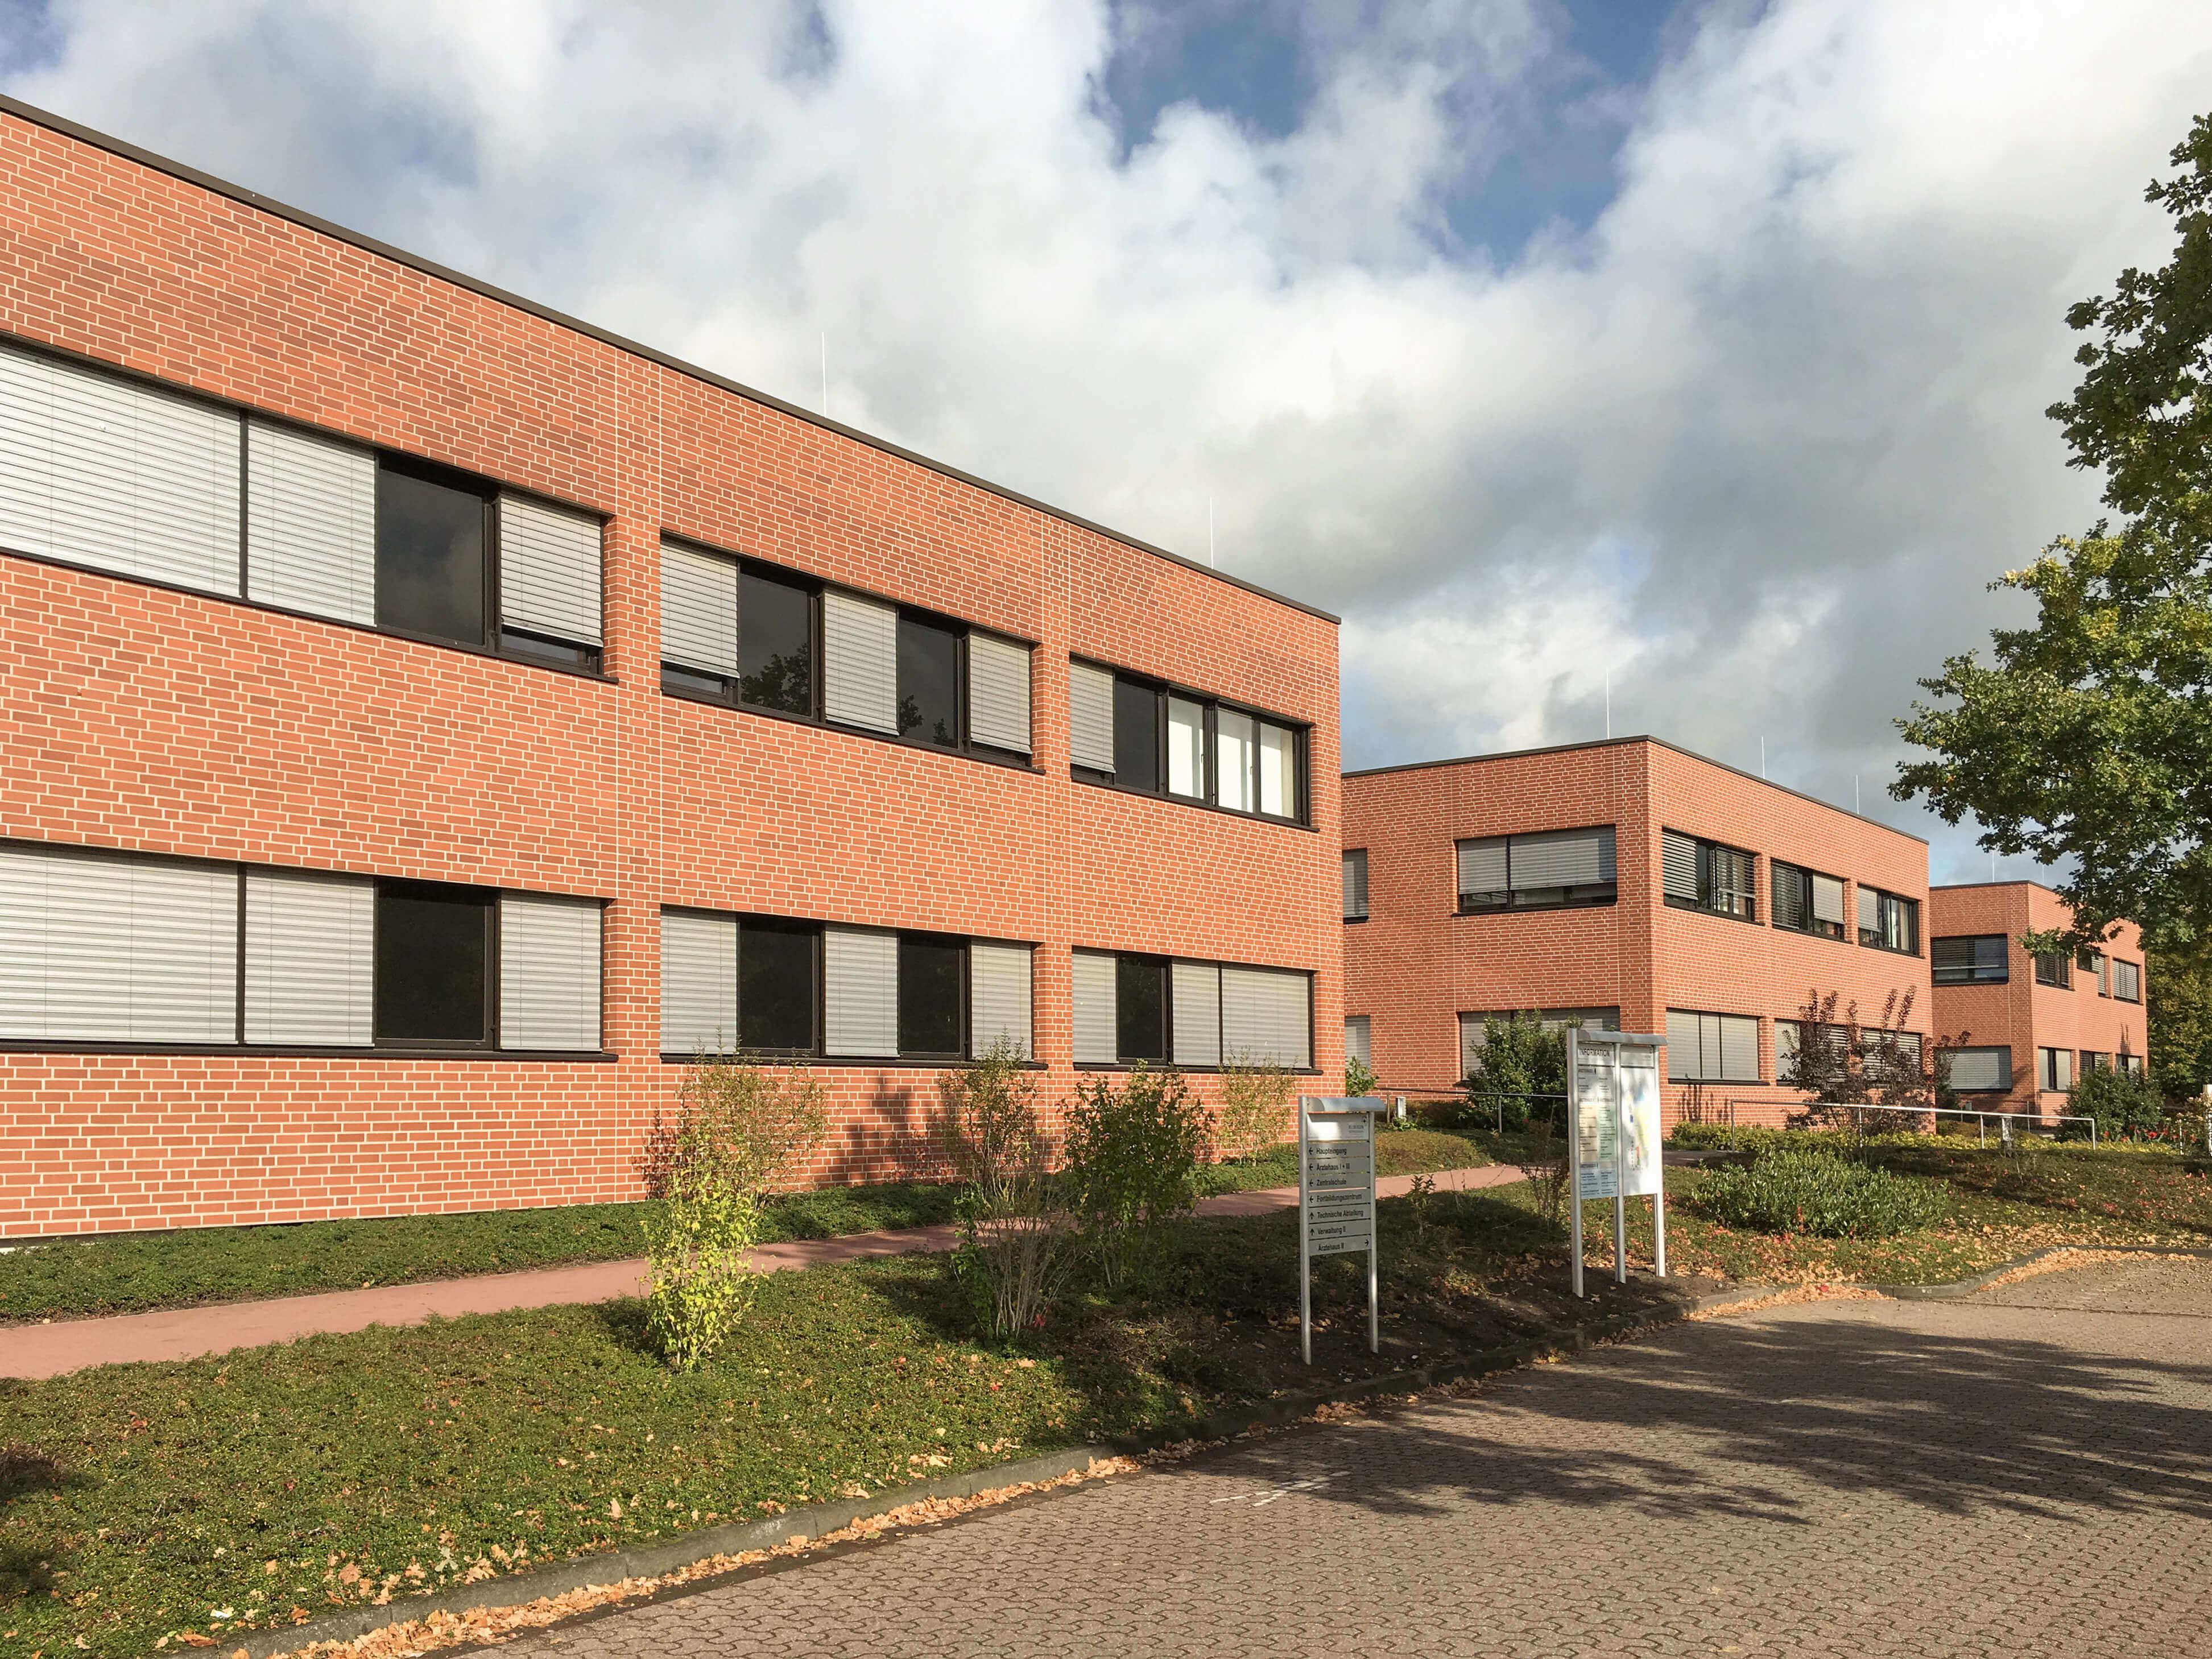 01-Ärztehaus-II